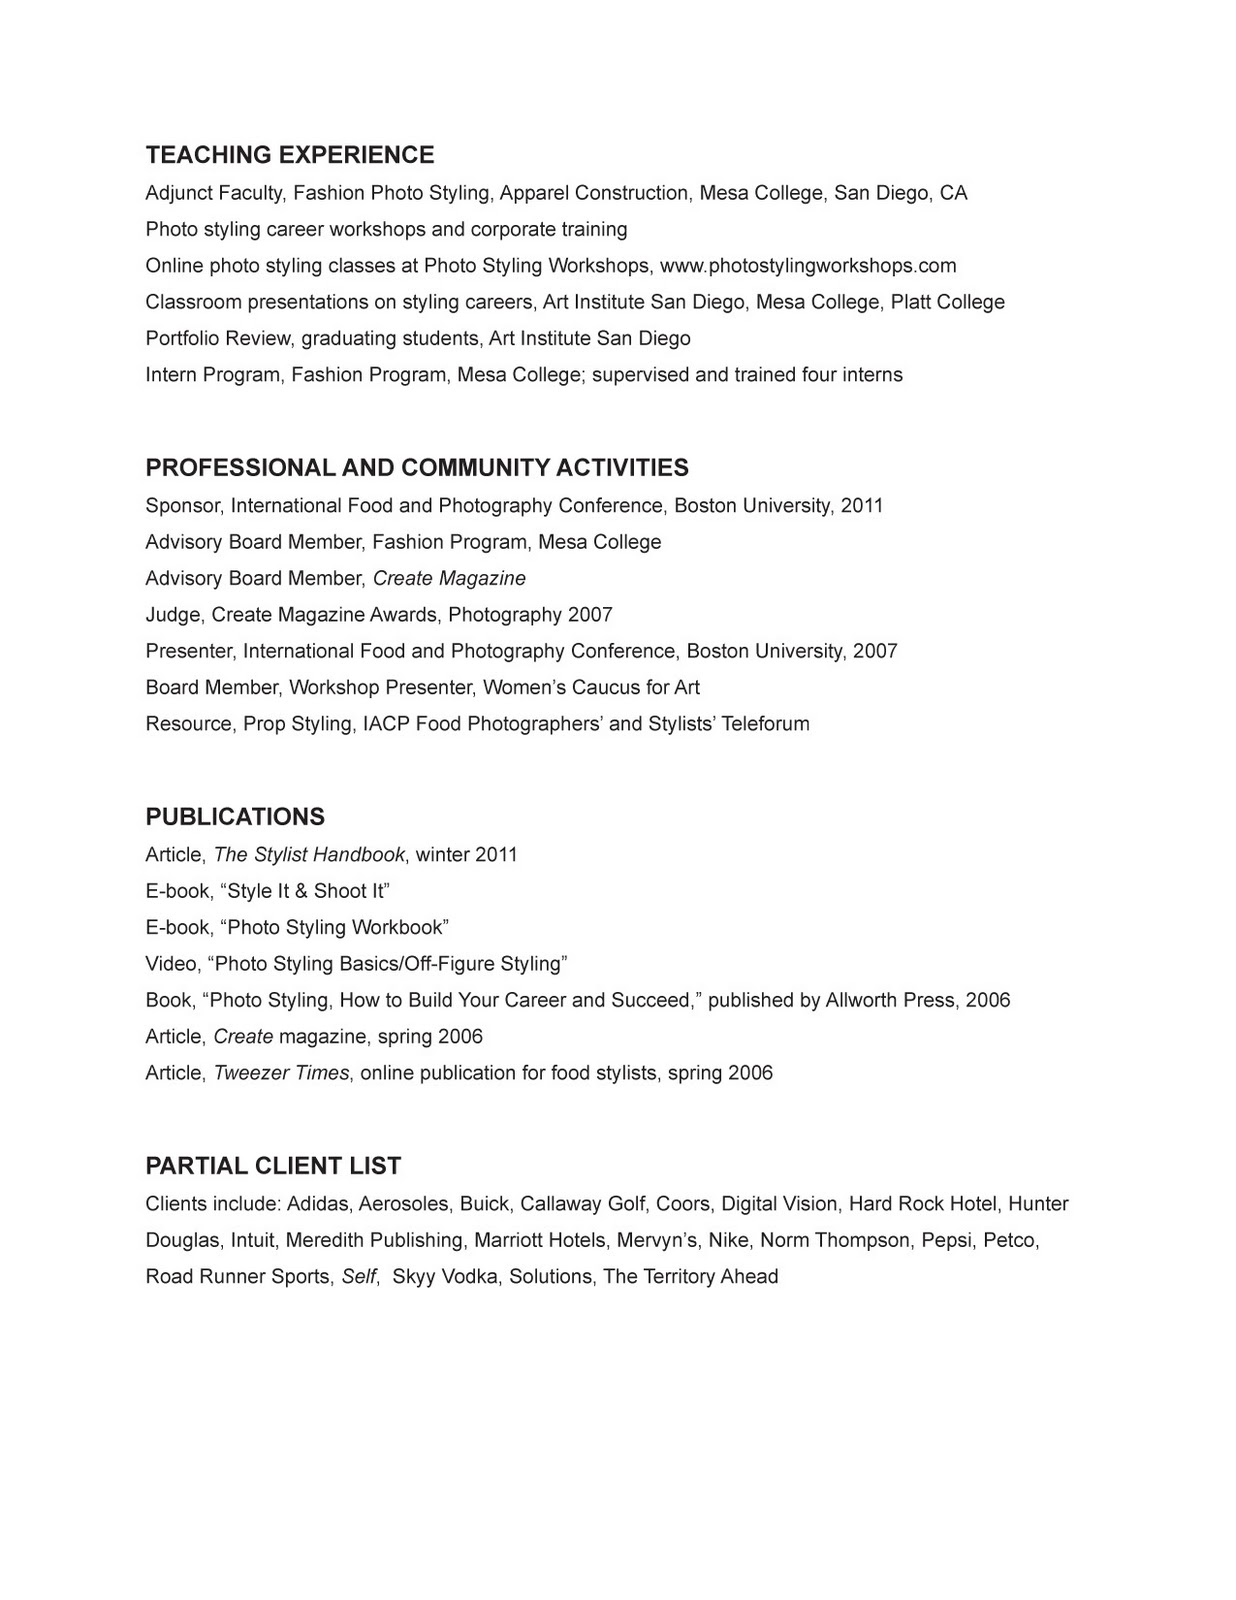 resume fancy resume templates elegant resume template free resume